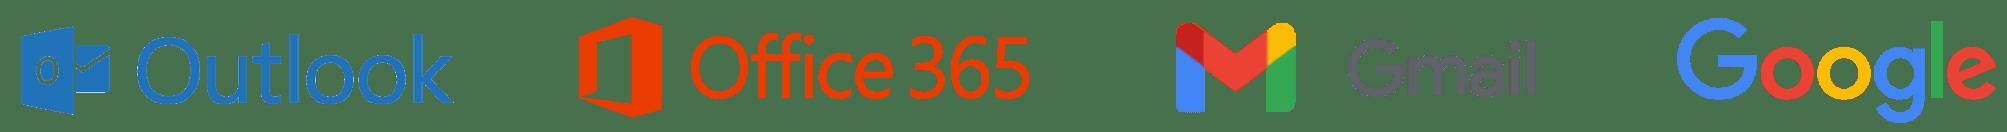 Outlook, Office 365, Gmail et Google Logo group